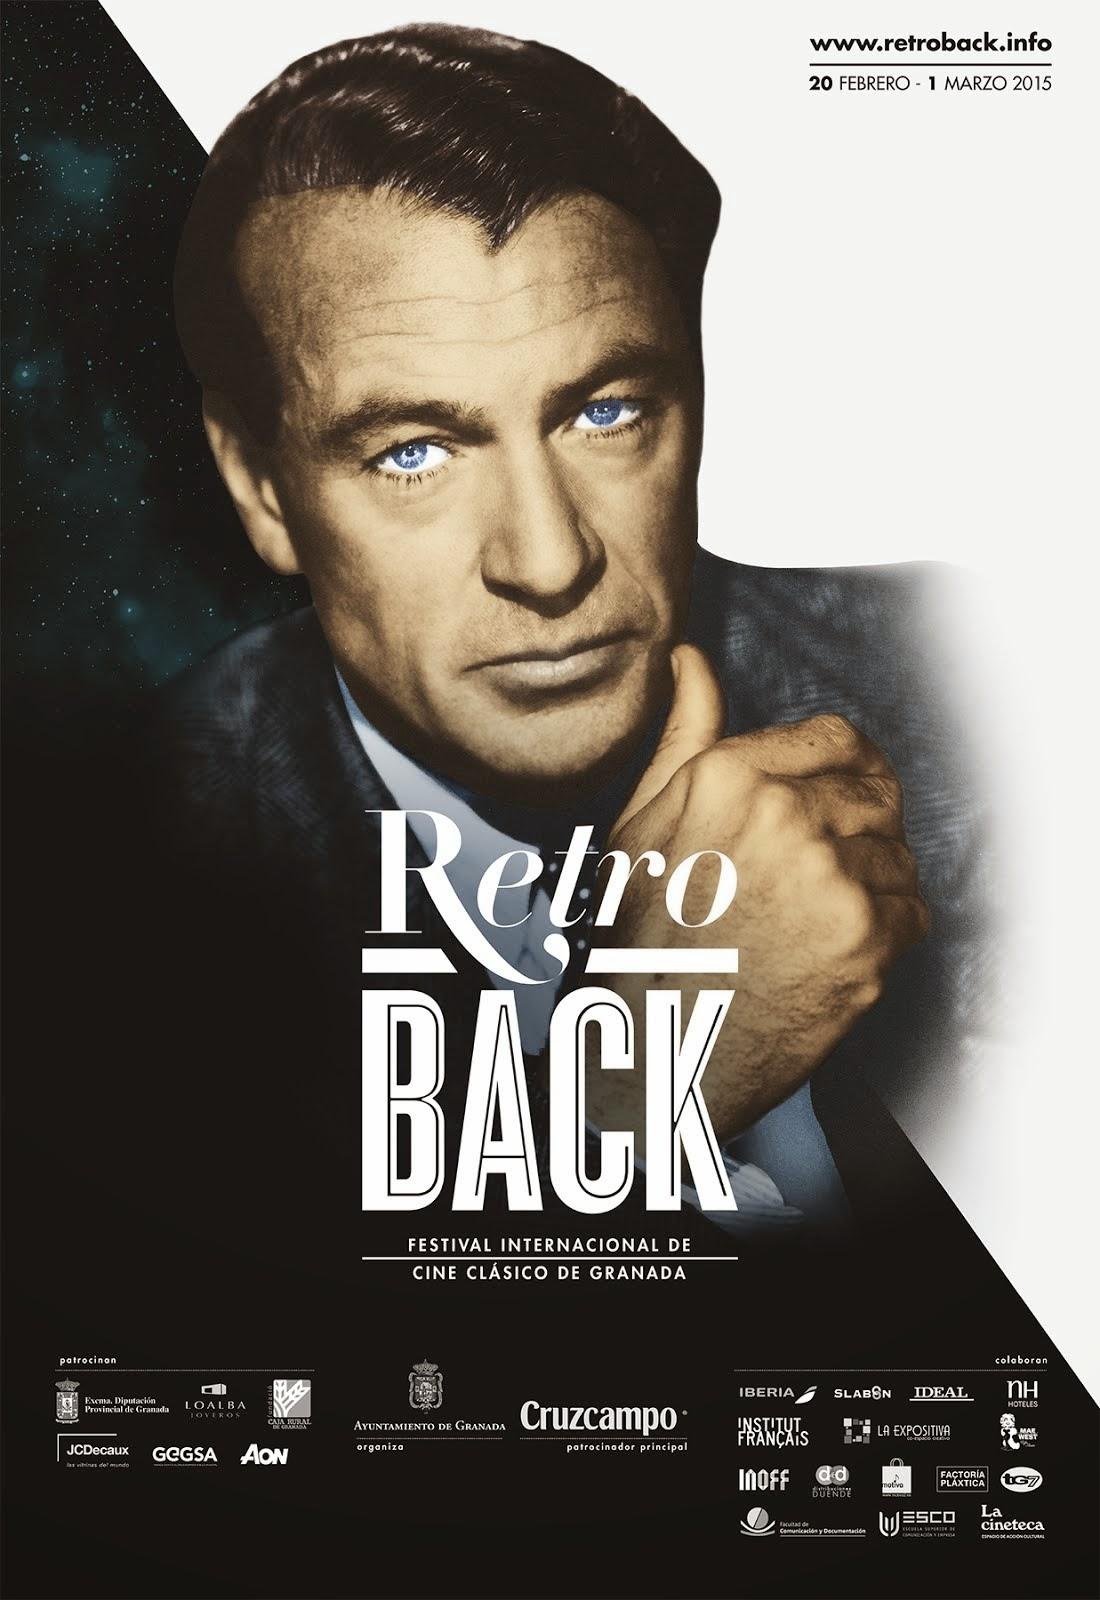 retroback 2015